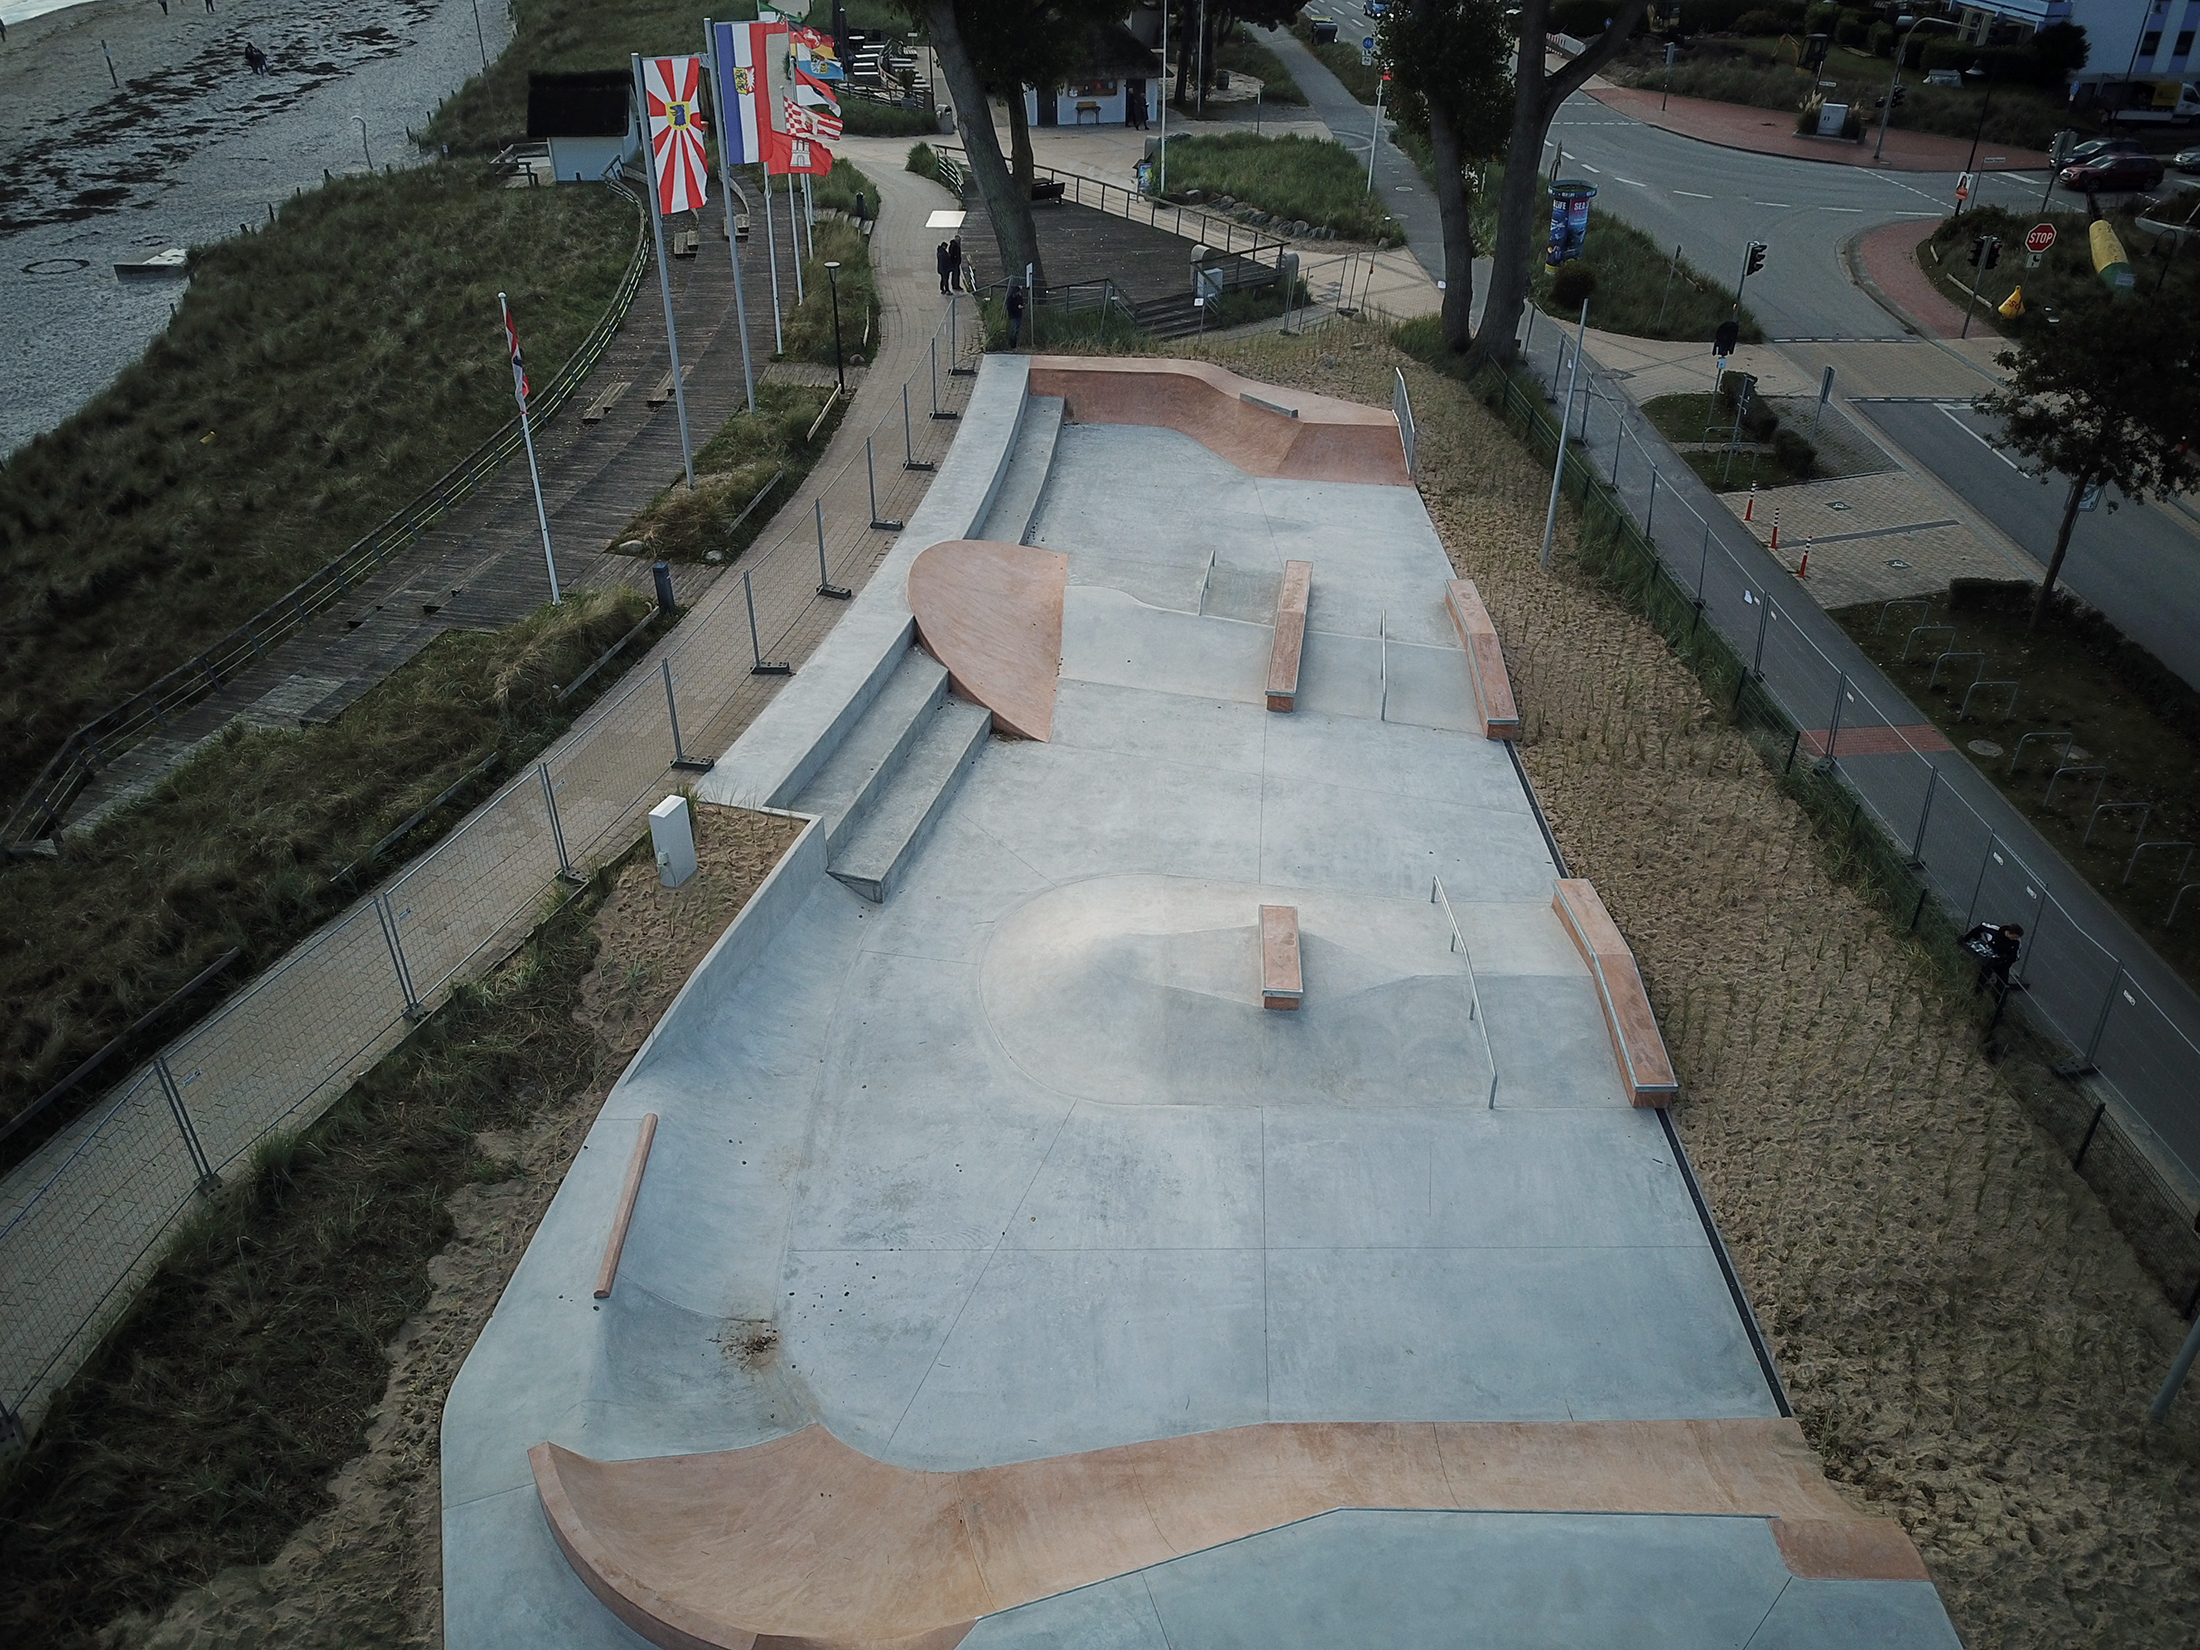 ML_Skatepark_Scharbeutz_04